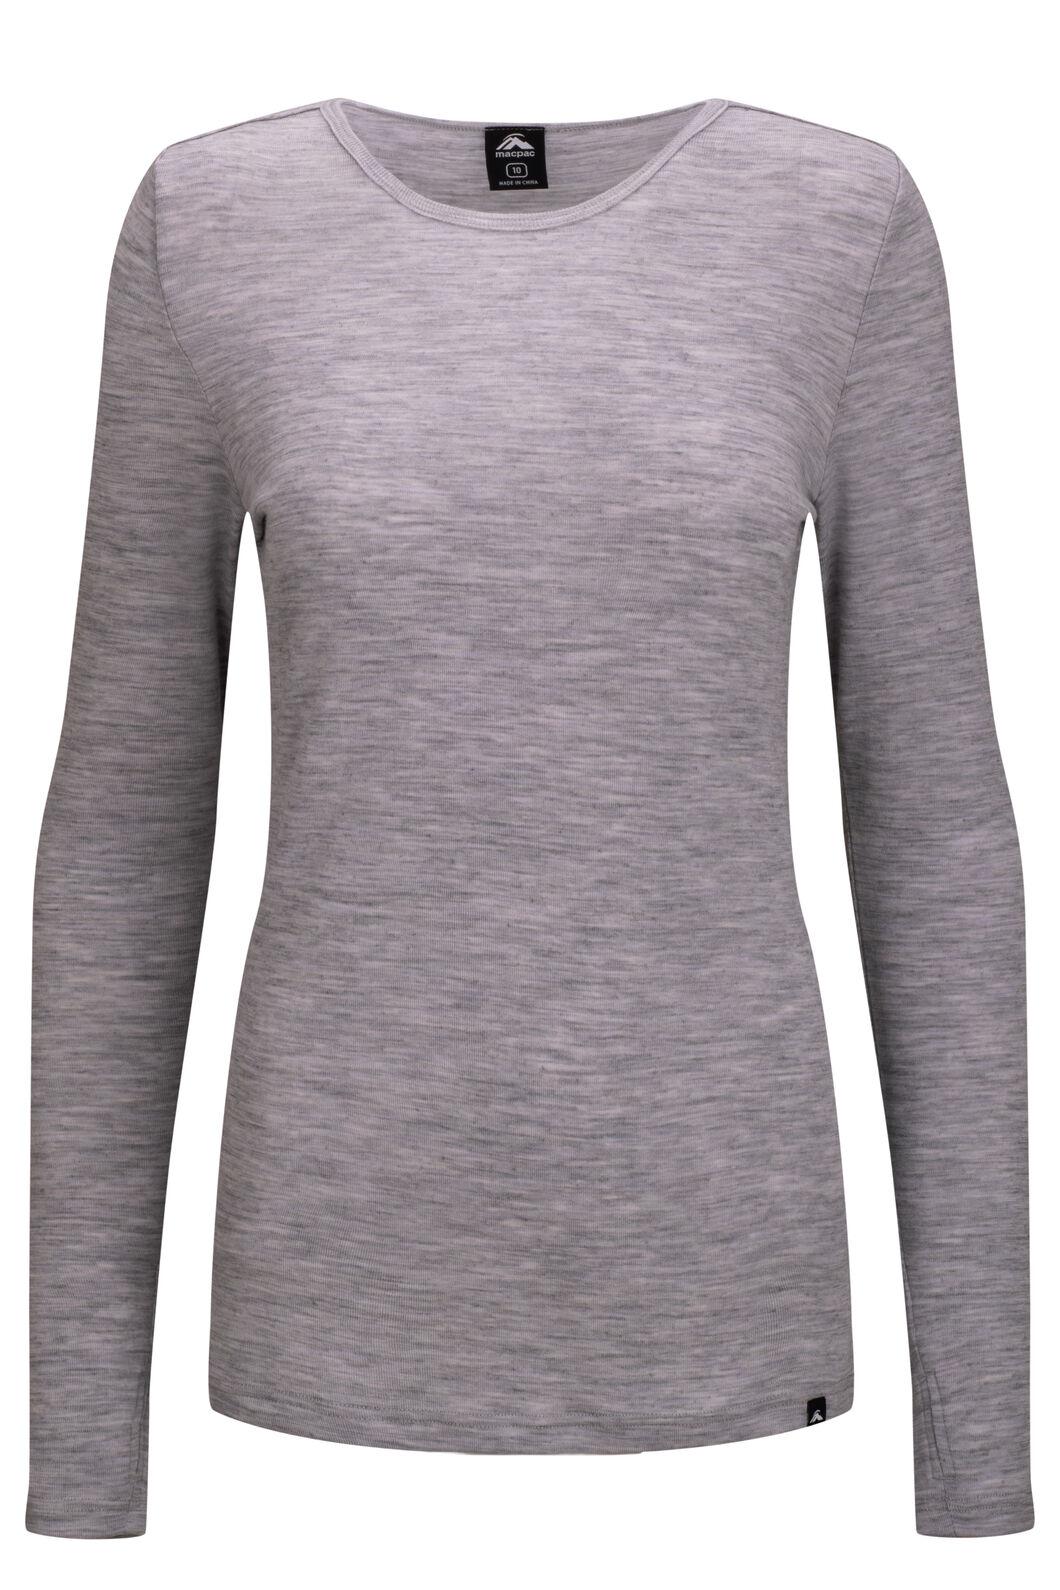 Macpac 220 Merino Long Sleeve Top — Women's, Light Grey Marle, hi-res